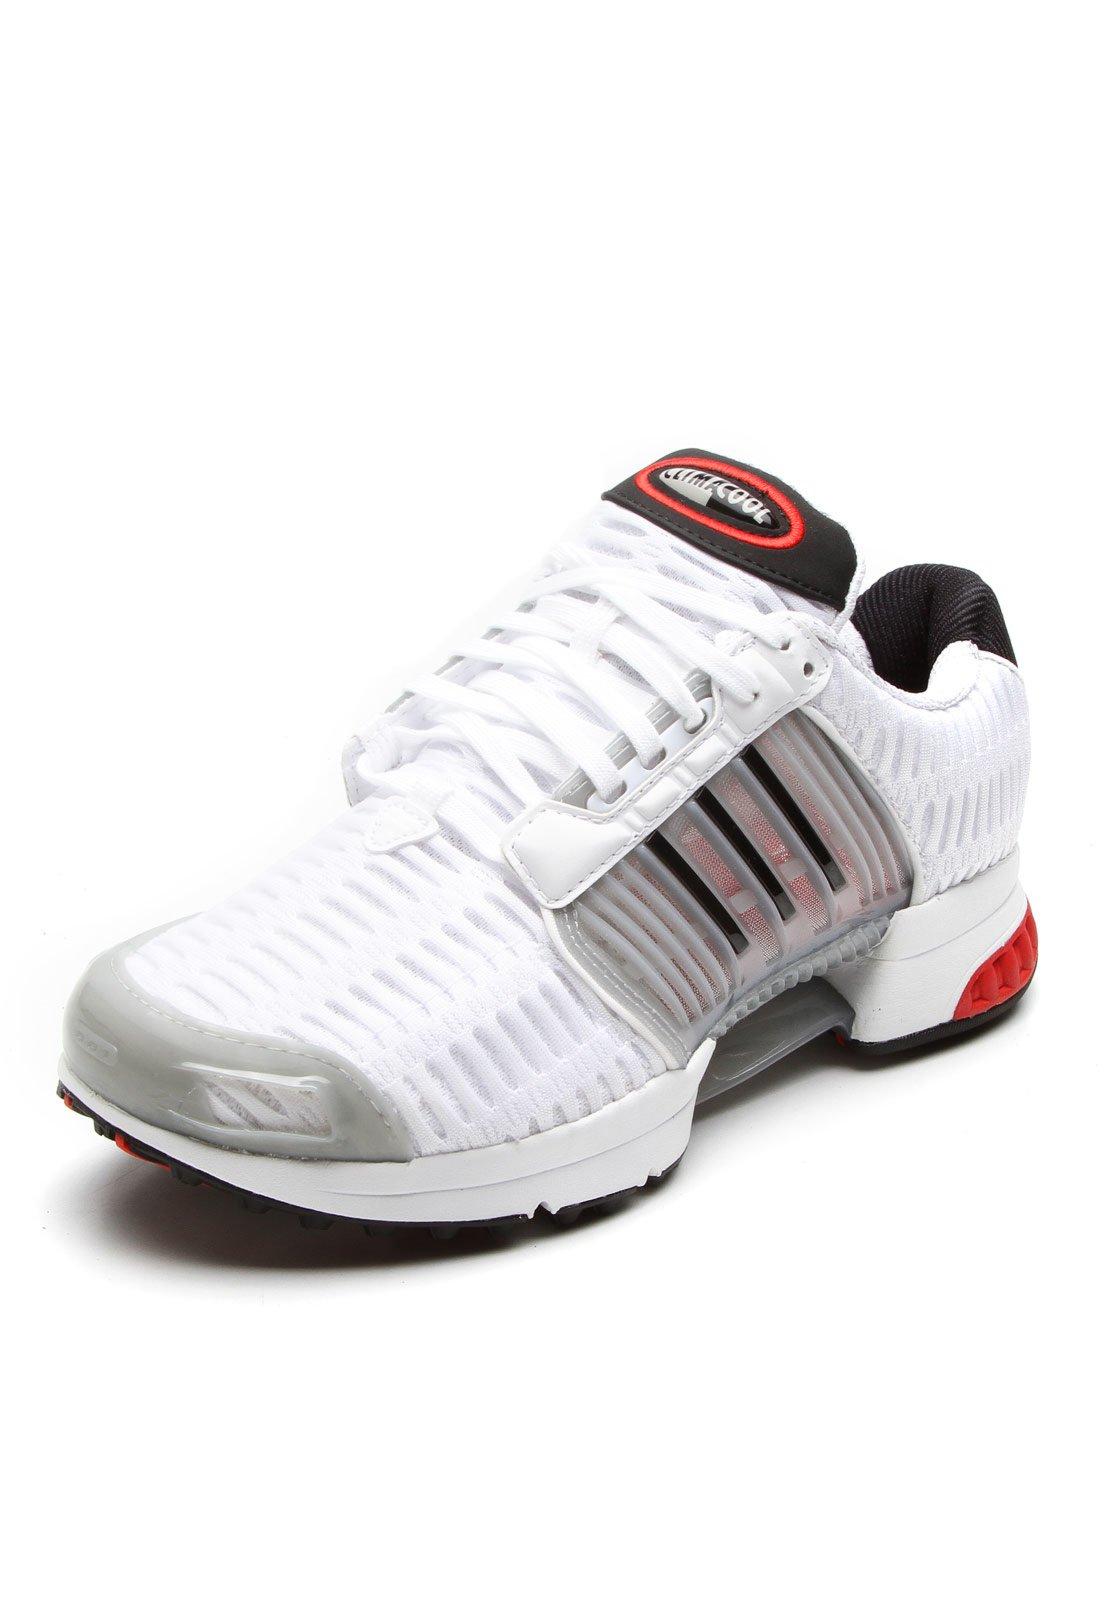 Tênis adidas Originals Climacool 1 BrancoPreto